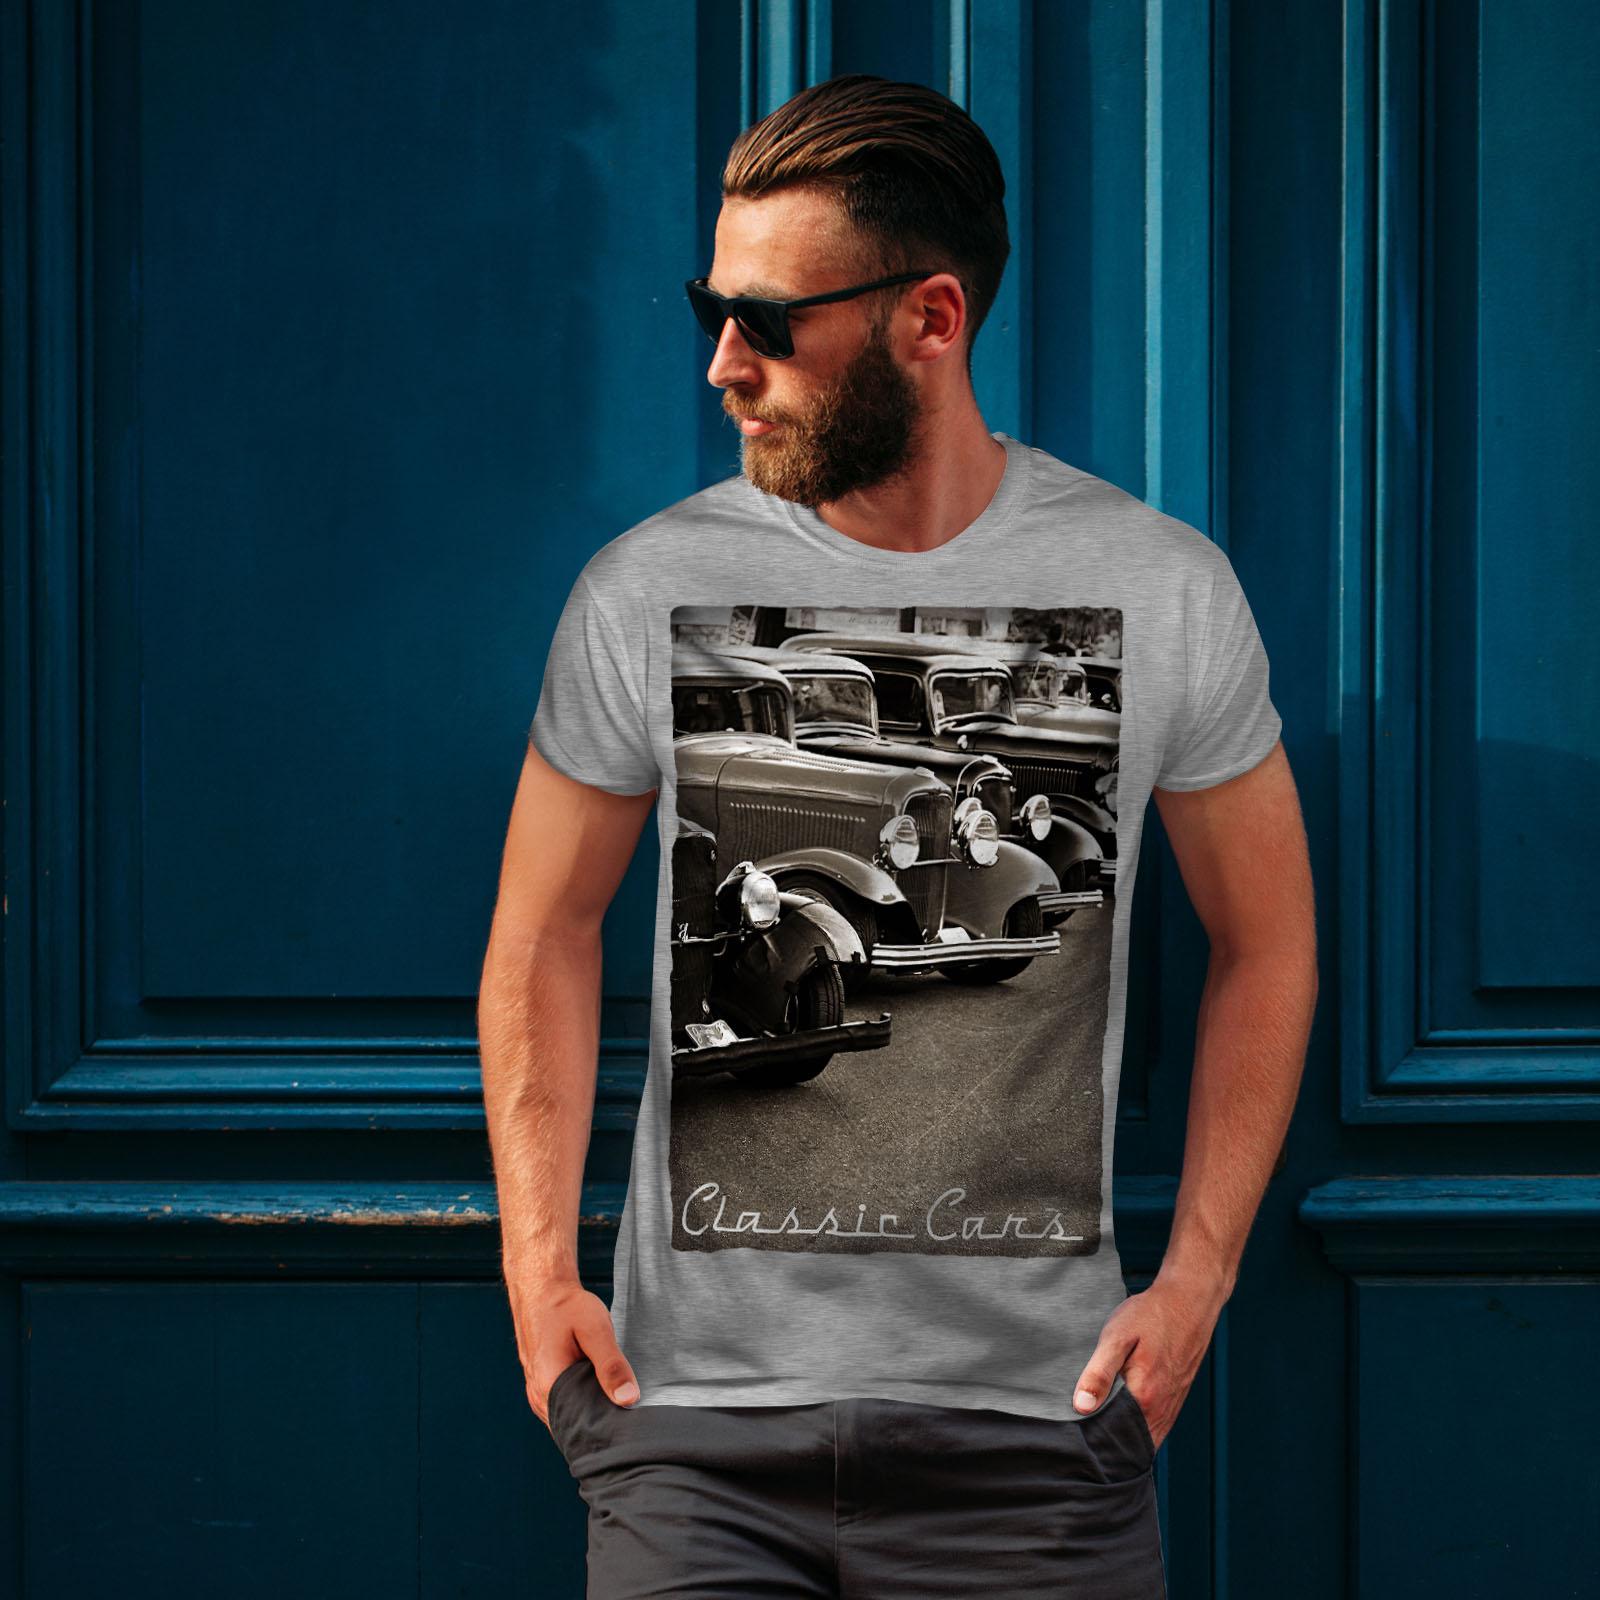 Wellcoda-Classic-Cars-Mens-T-shirt-Retro-Graphic-Design-Printed-Tee thumbnail 16